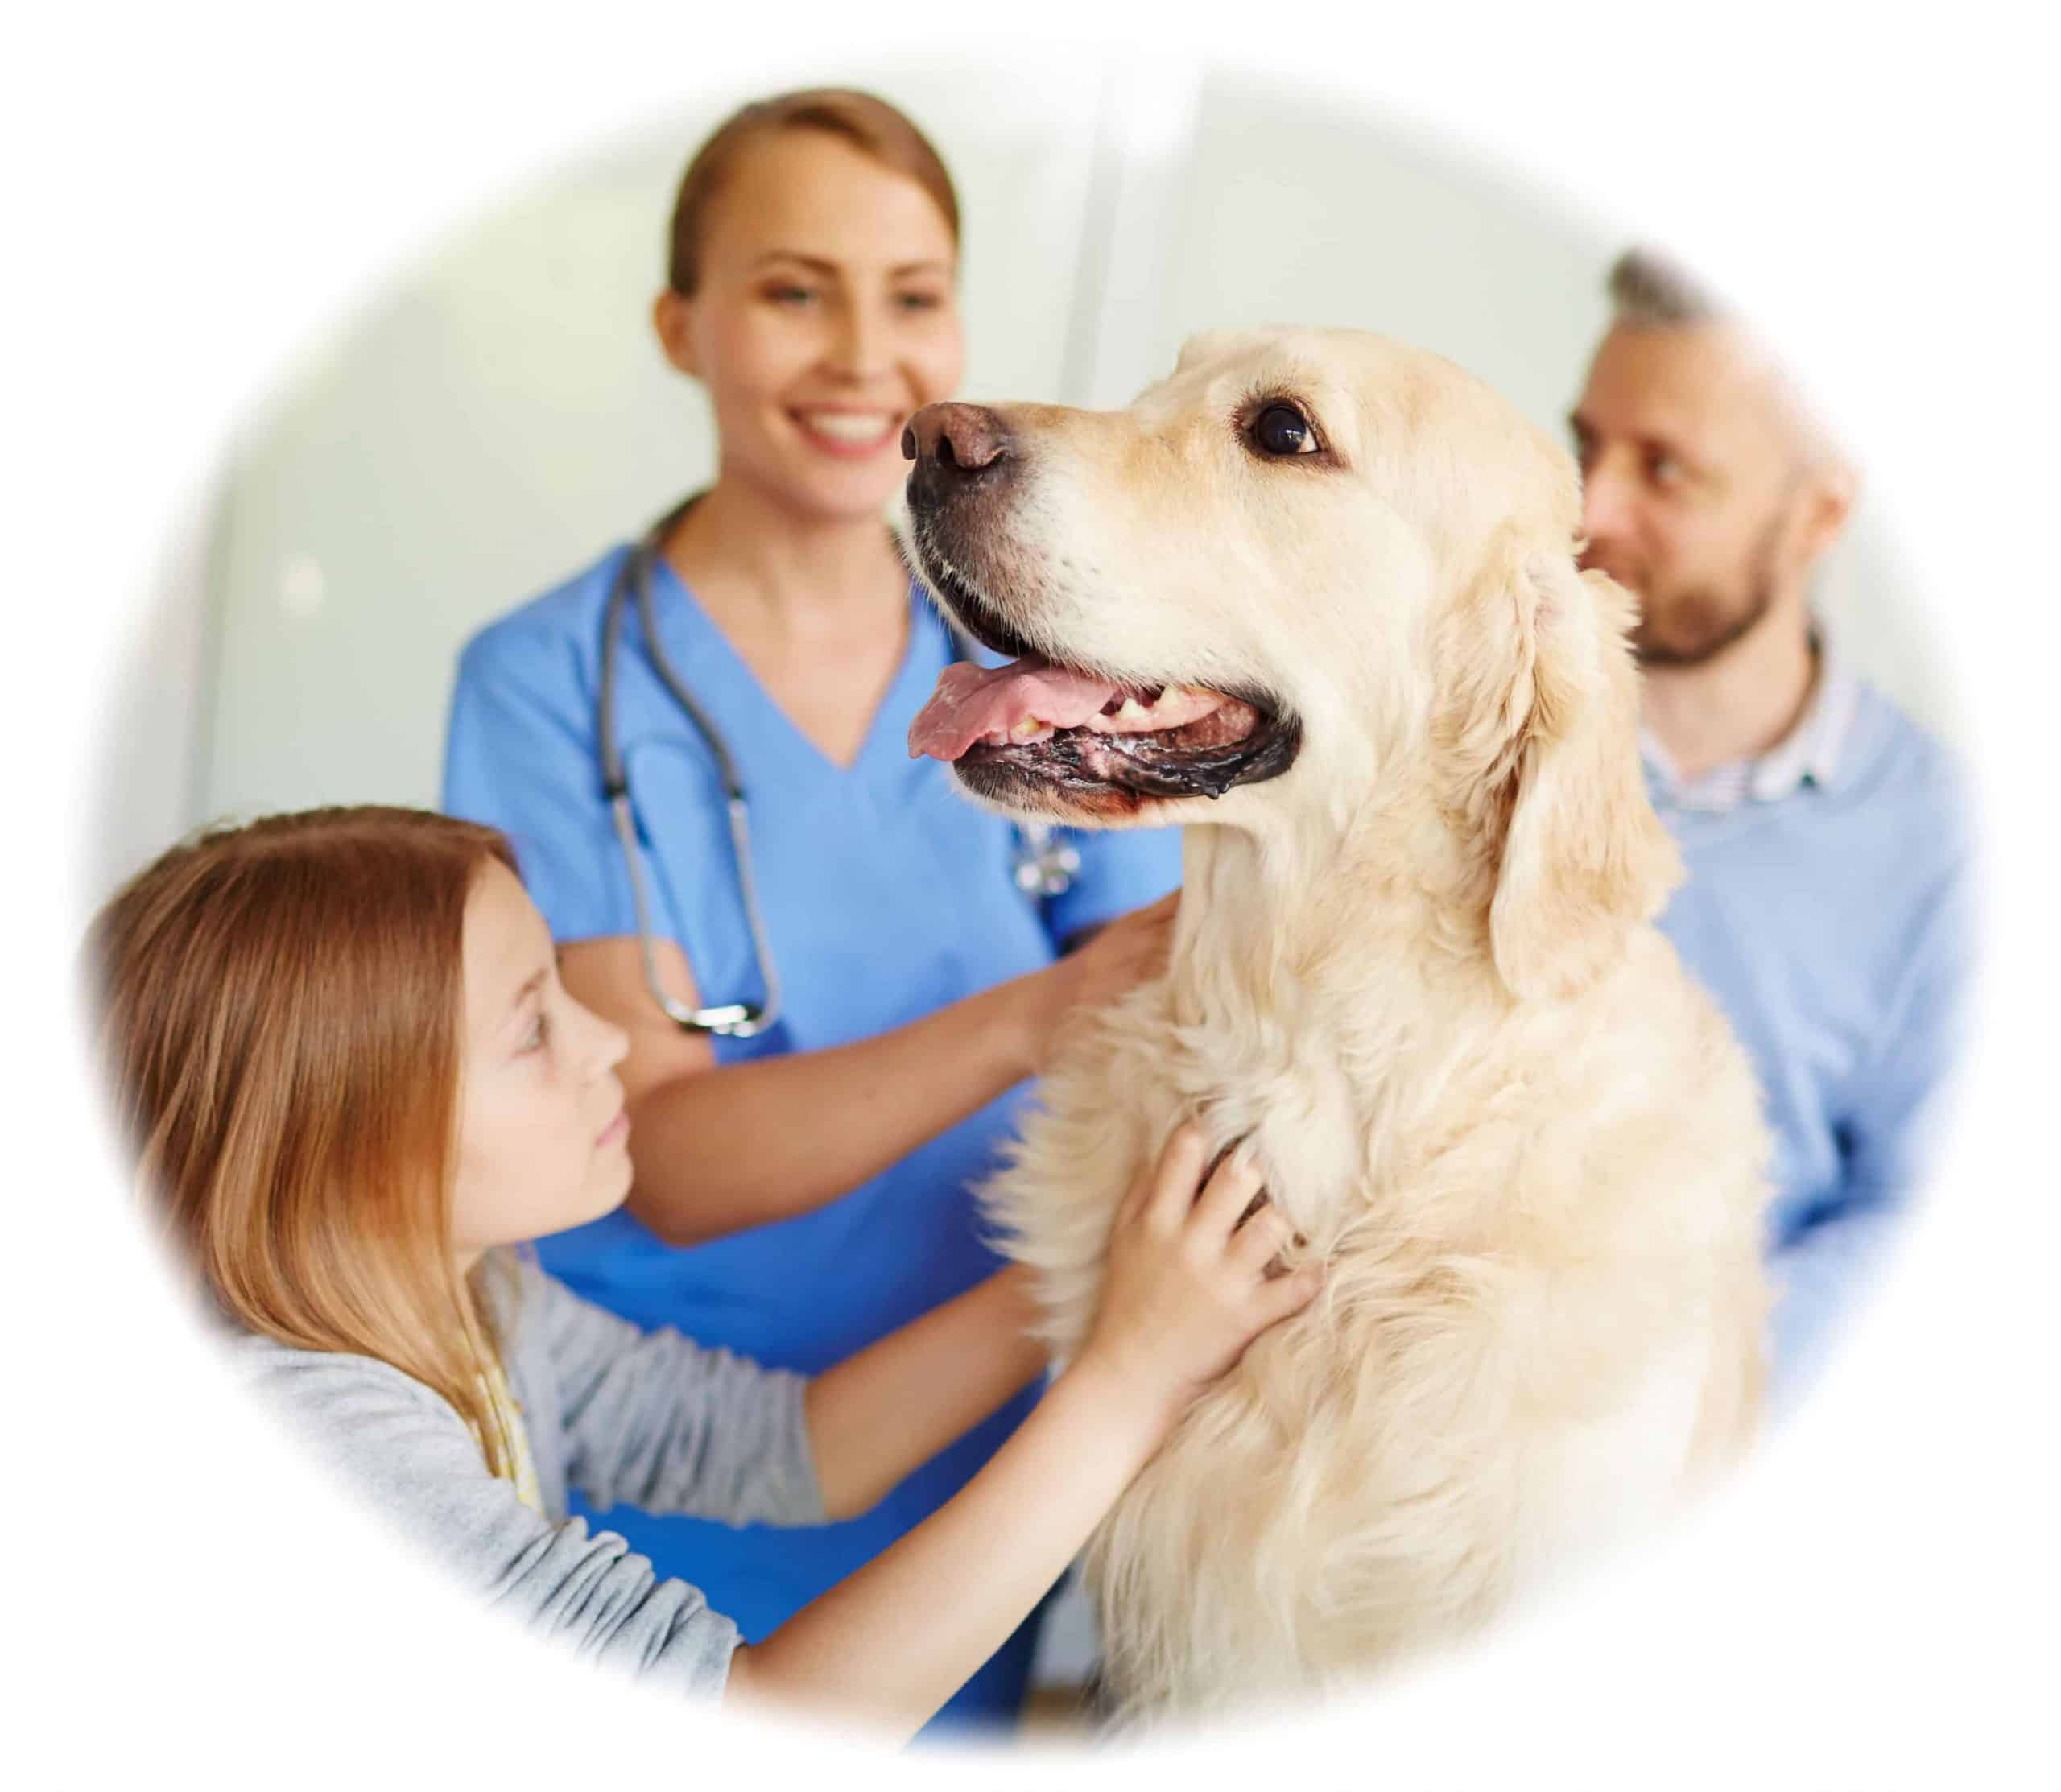 Vet Nurse Training and Course - become a vet nurse